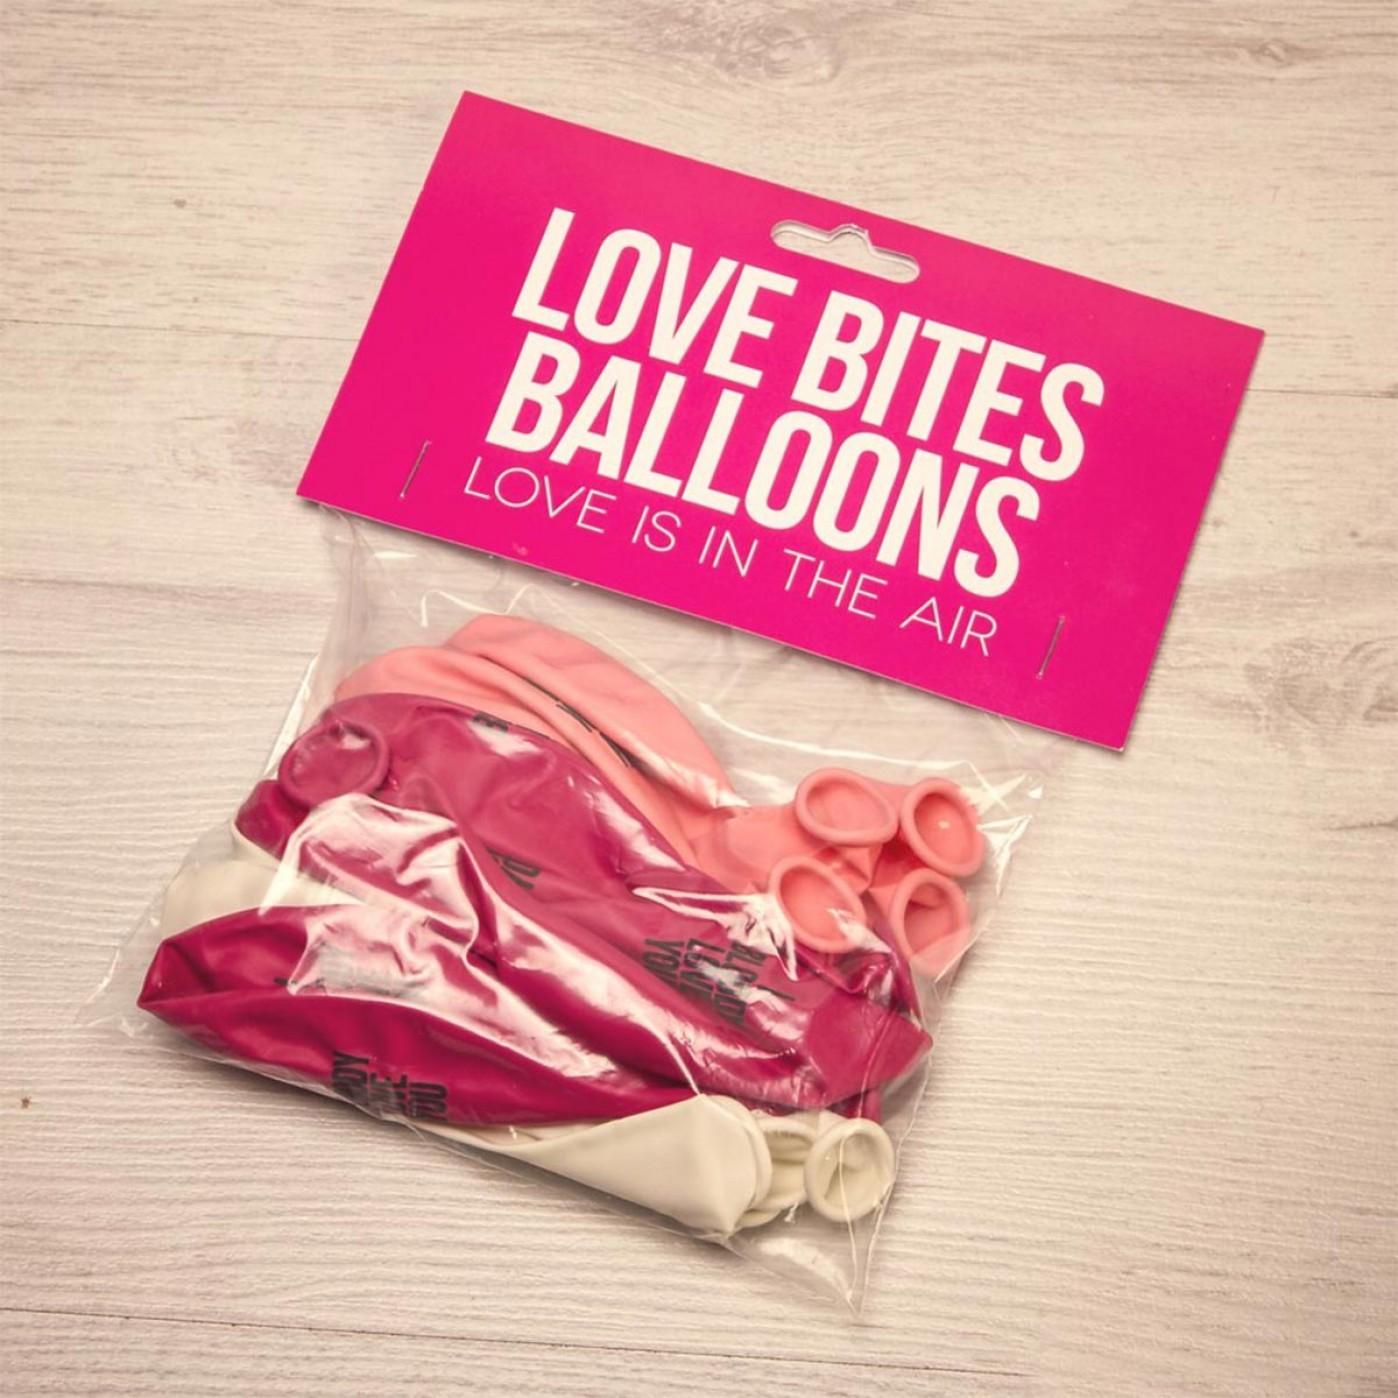 Love Bites Balloons image